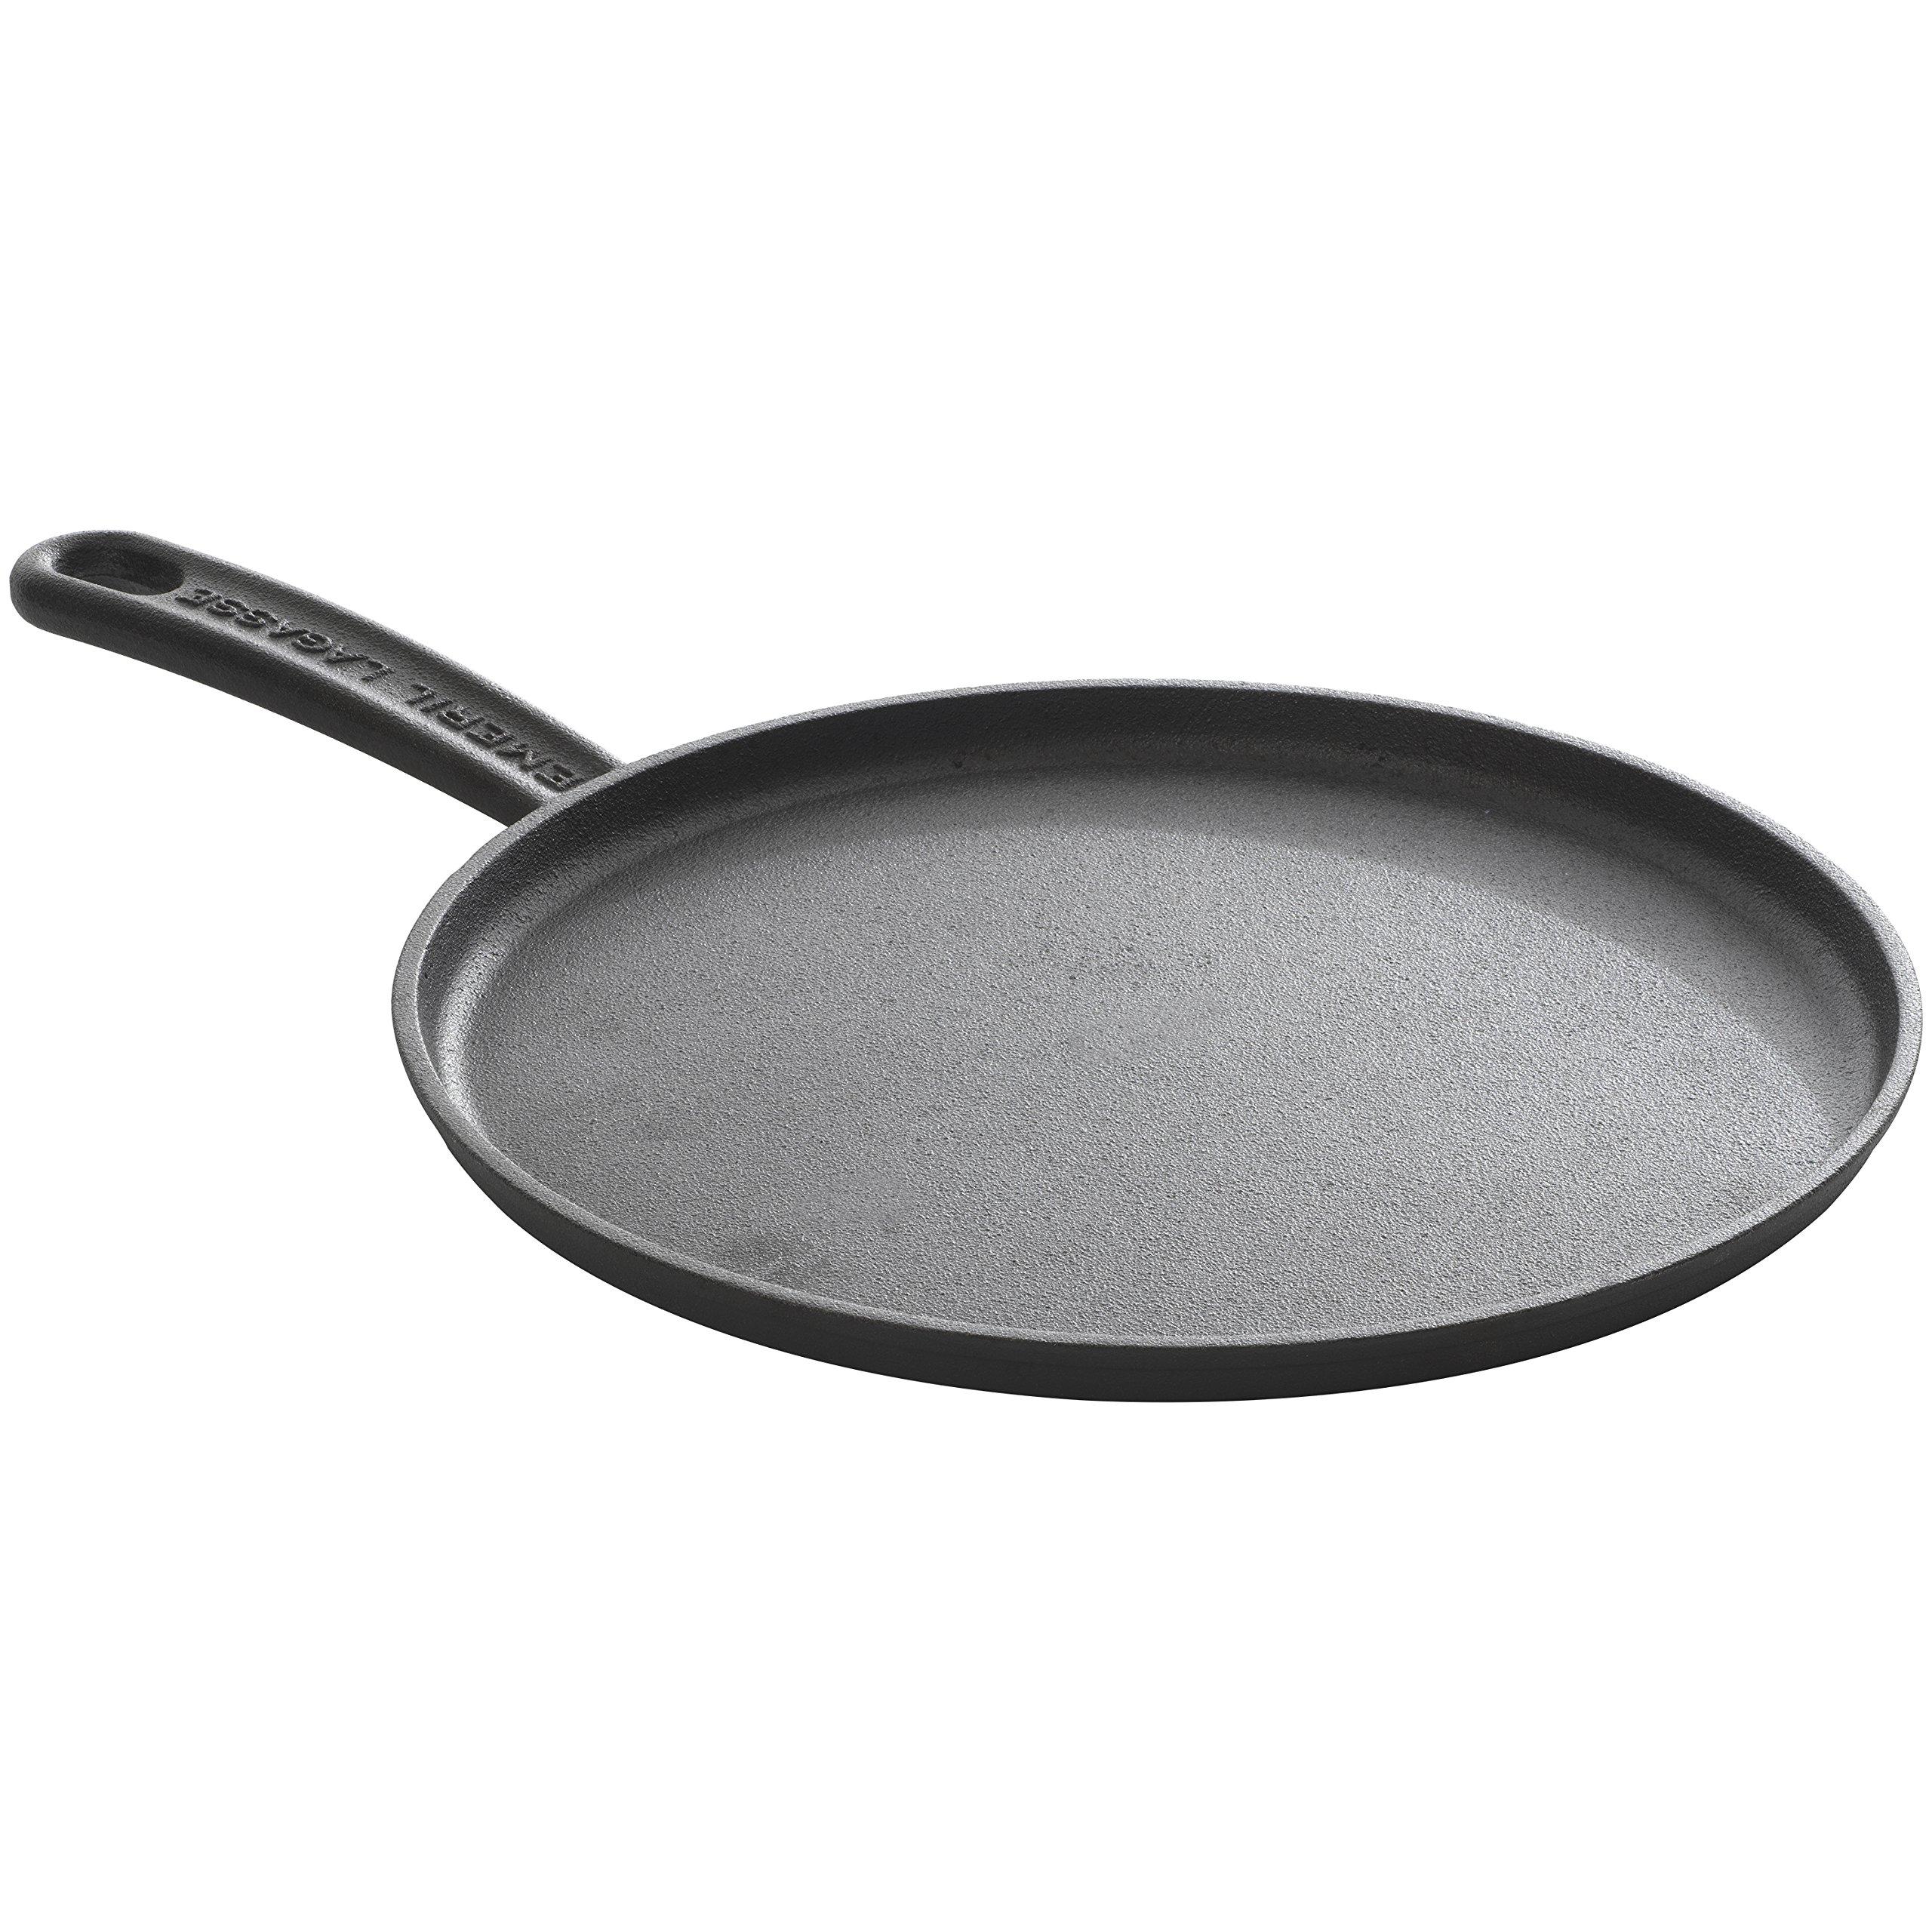 Emeril Lagasse 63078, pre-seasoned cast iron 11-inch round griddle , black